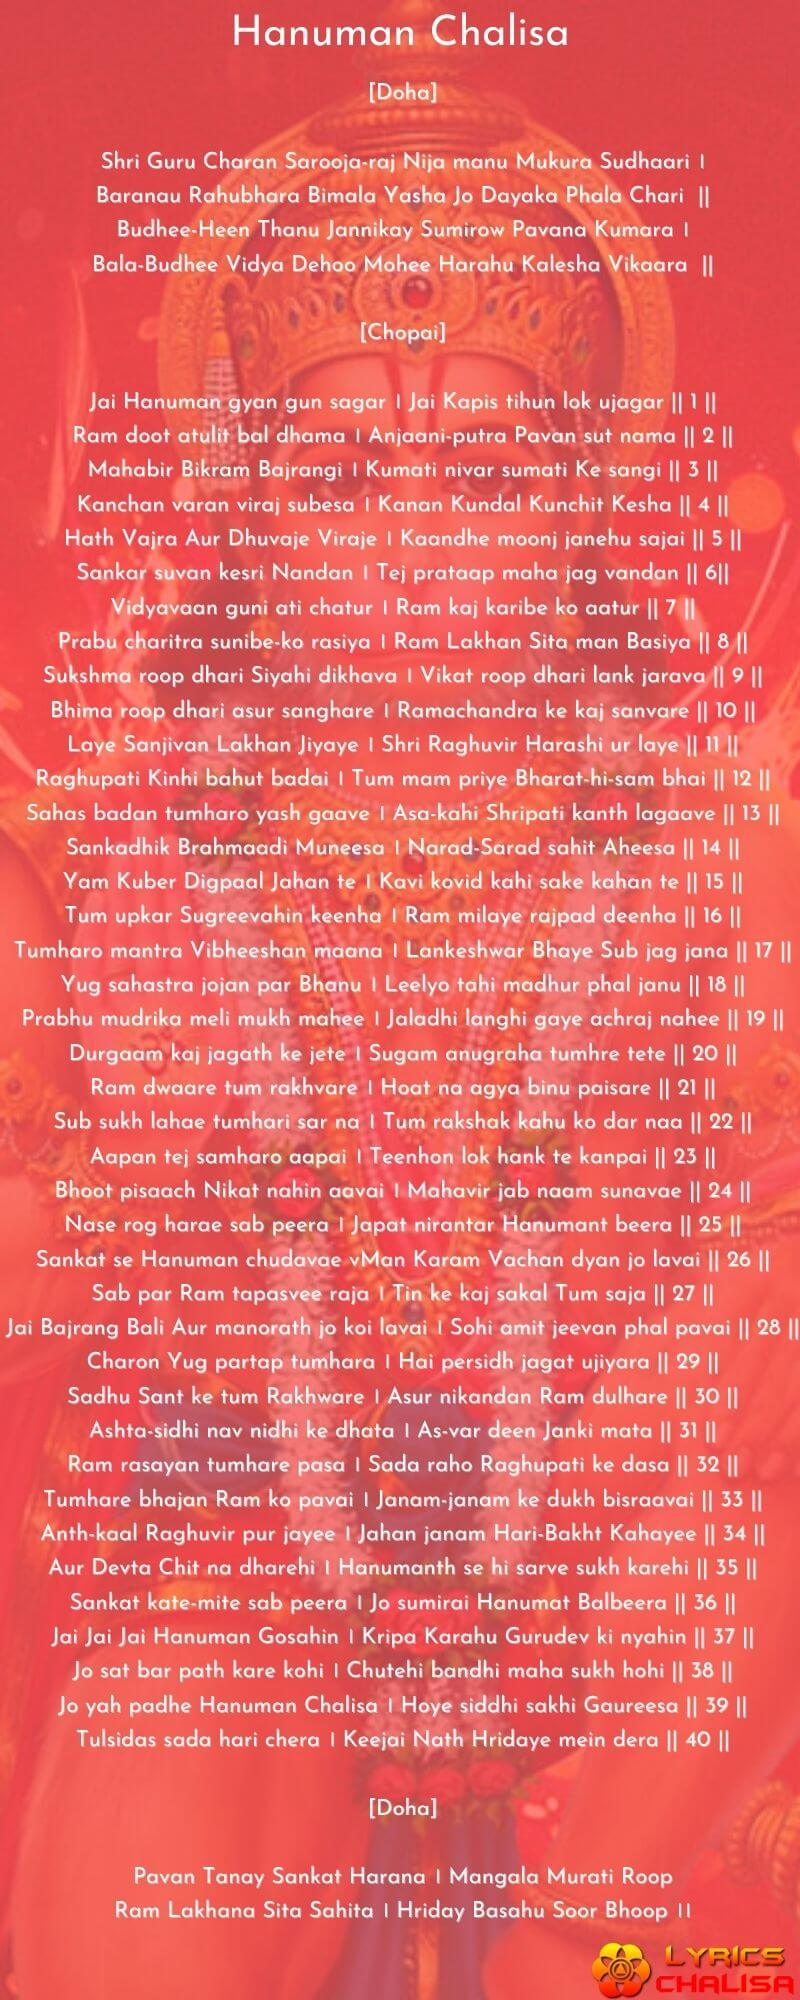 Shree Hanuman Chalisa Lyrics In english With PDF